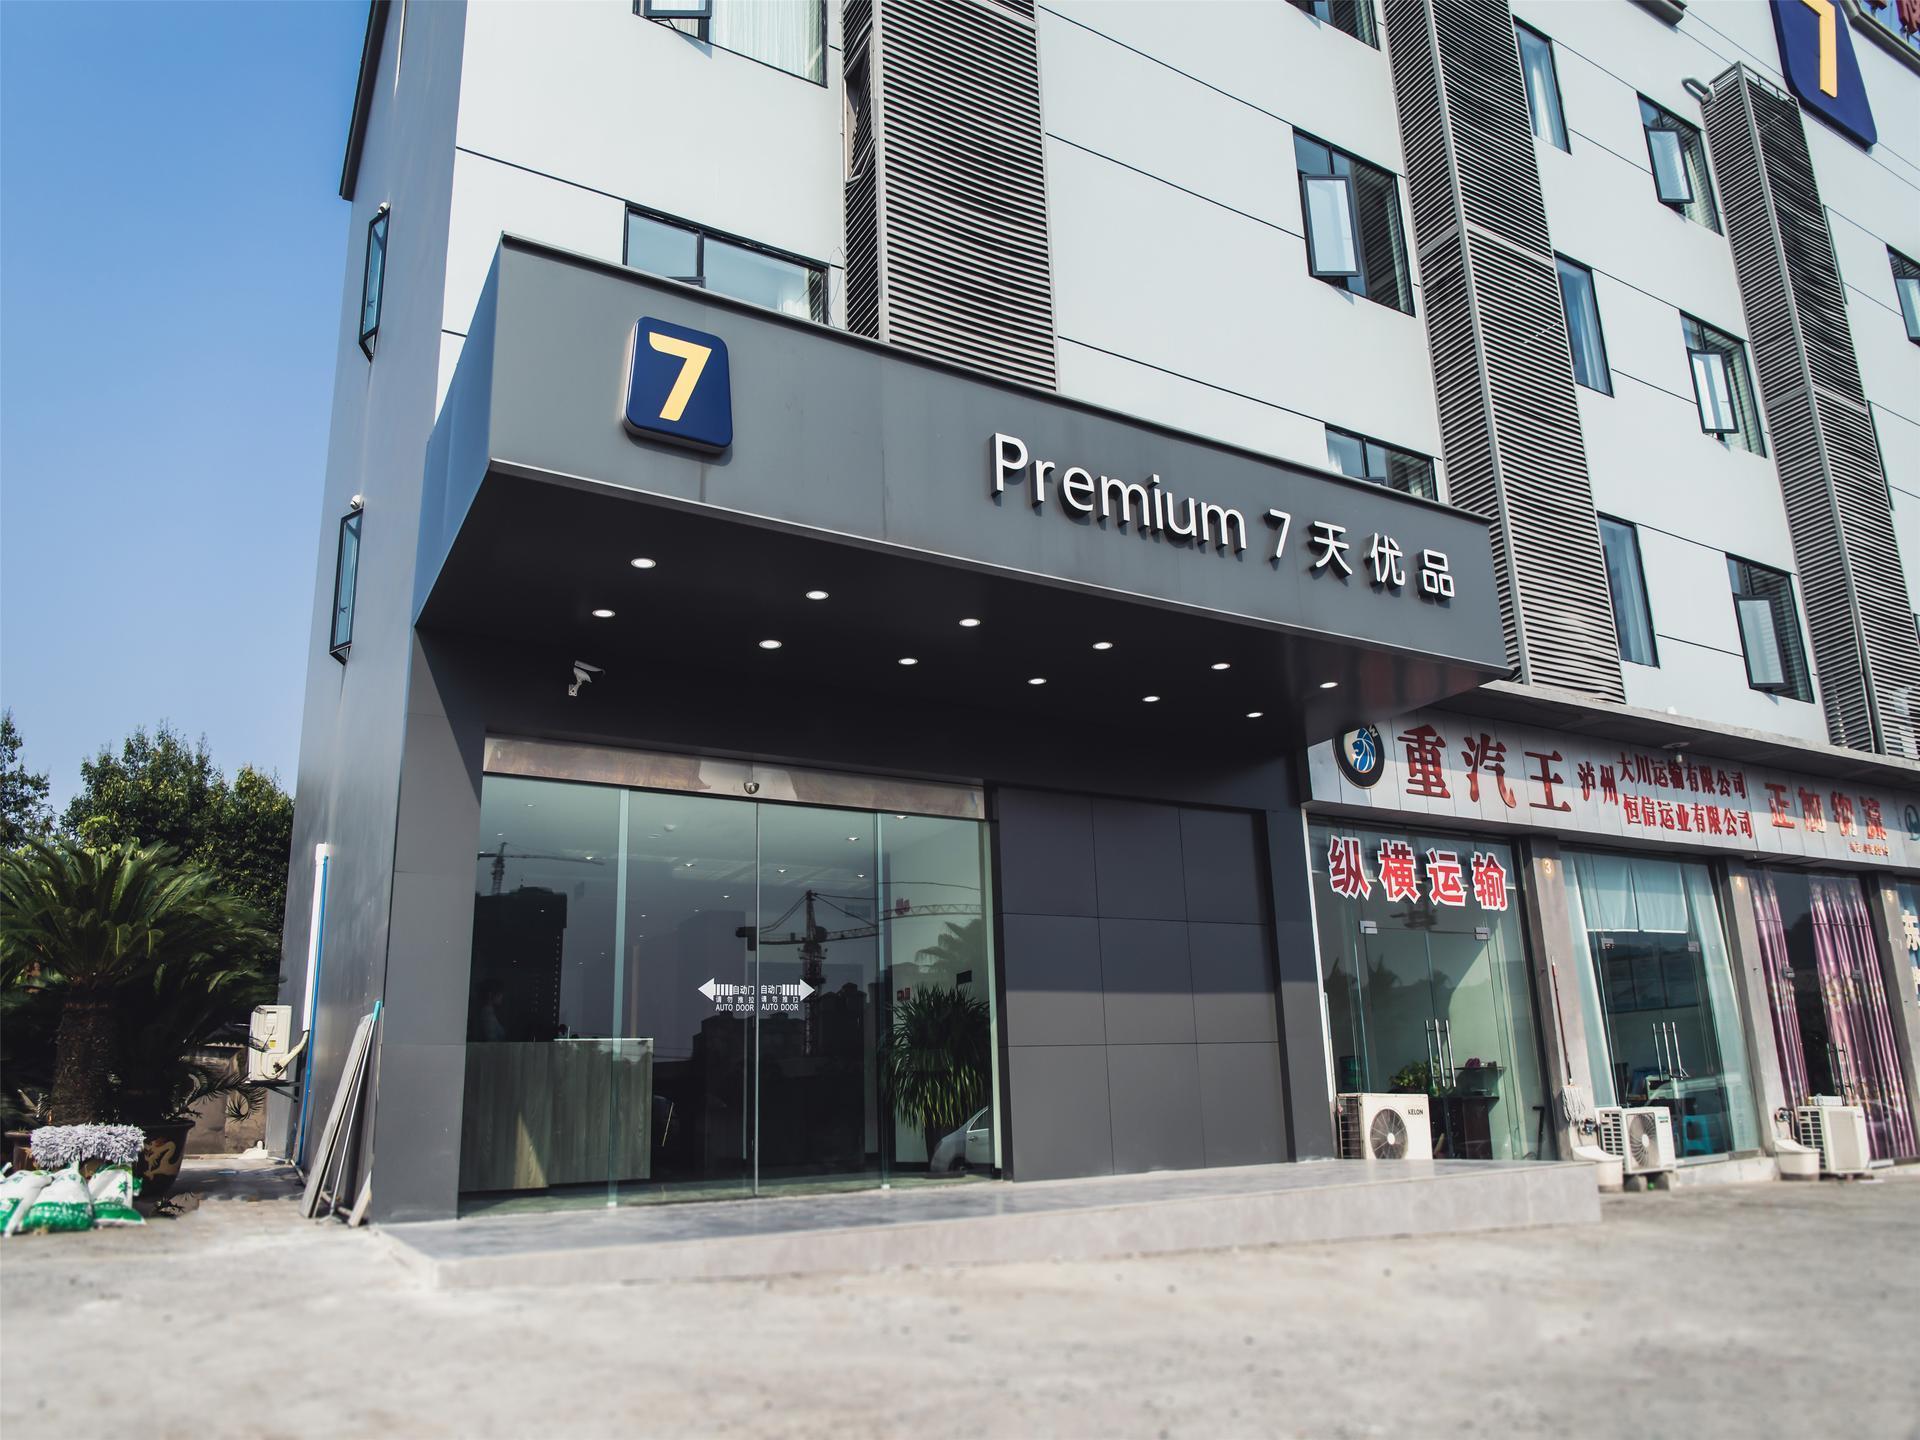 7 Days Premium Hotel Luzhou Lanan Avenue